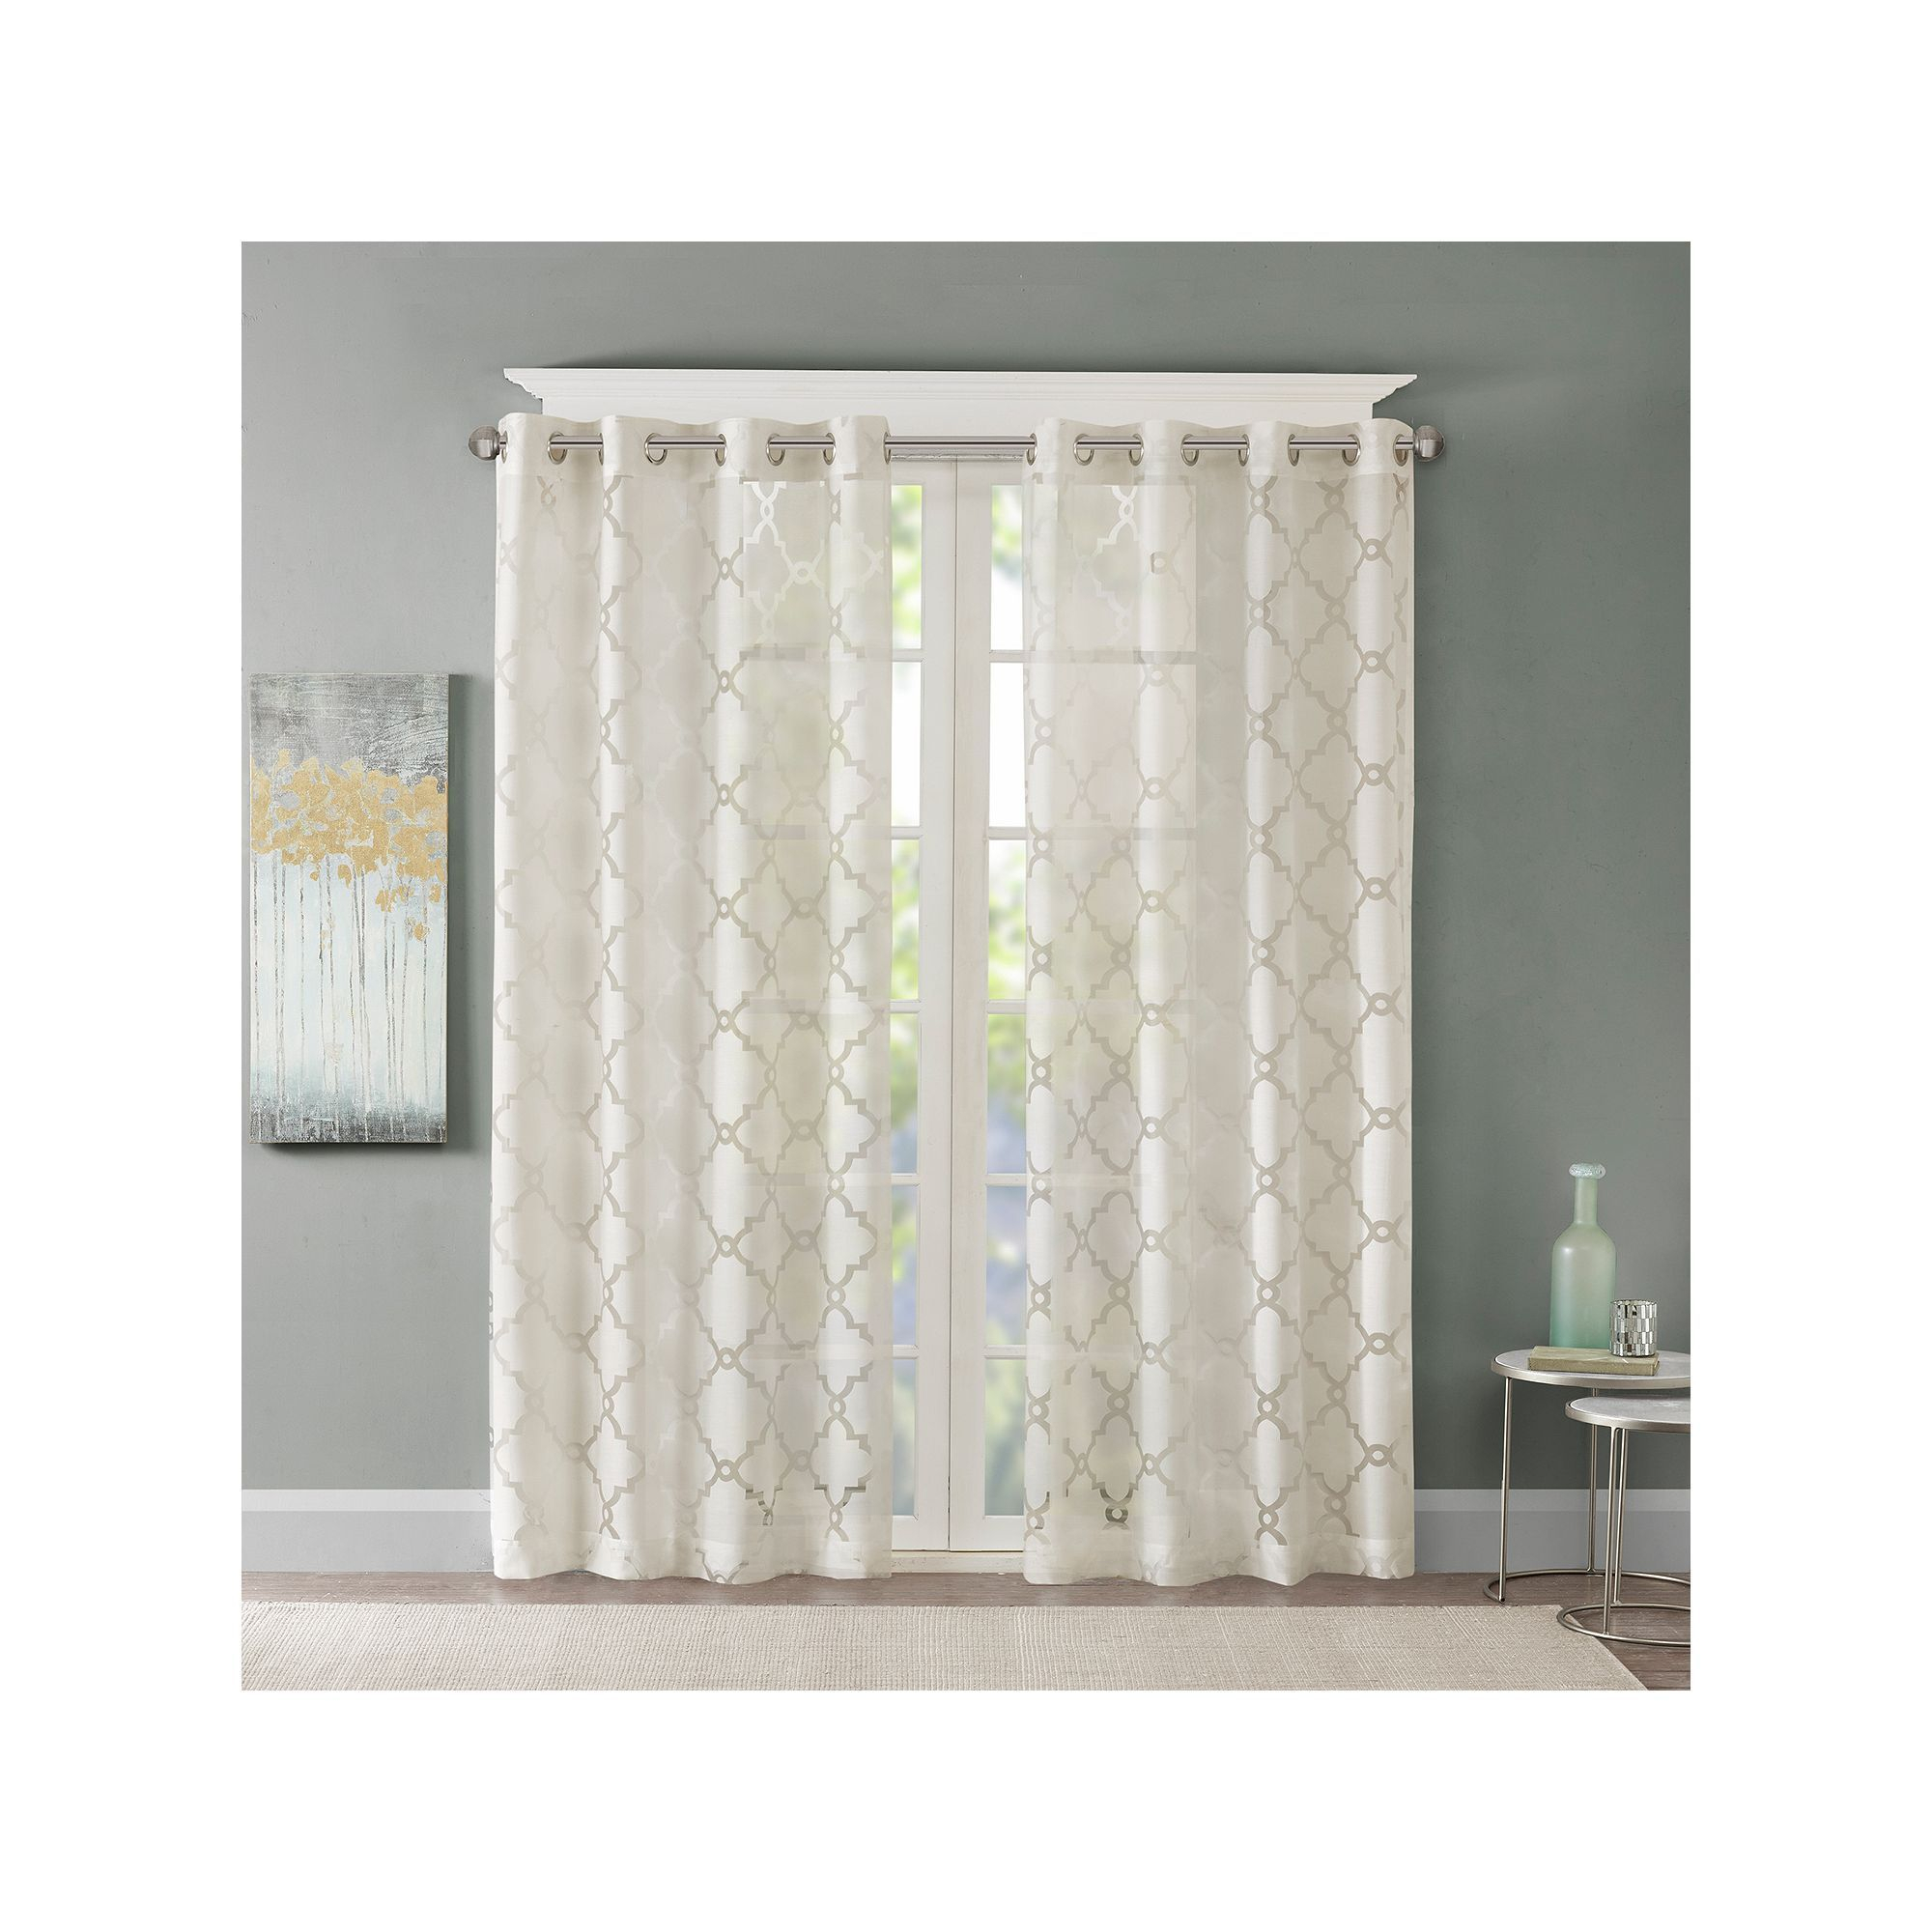 Madison Home Usa 1 Panel Laya Fretwork Sheer Window Curtain For Laya Fretwork Burnout Sheer Curtain Panels (View 7 of 20)